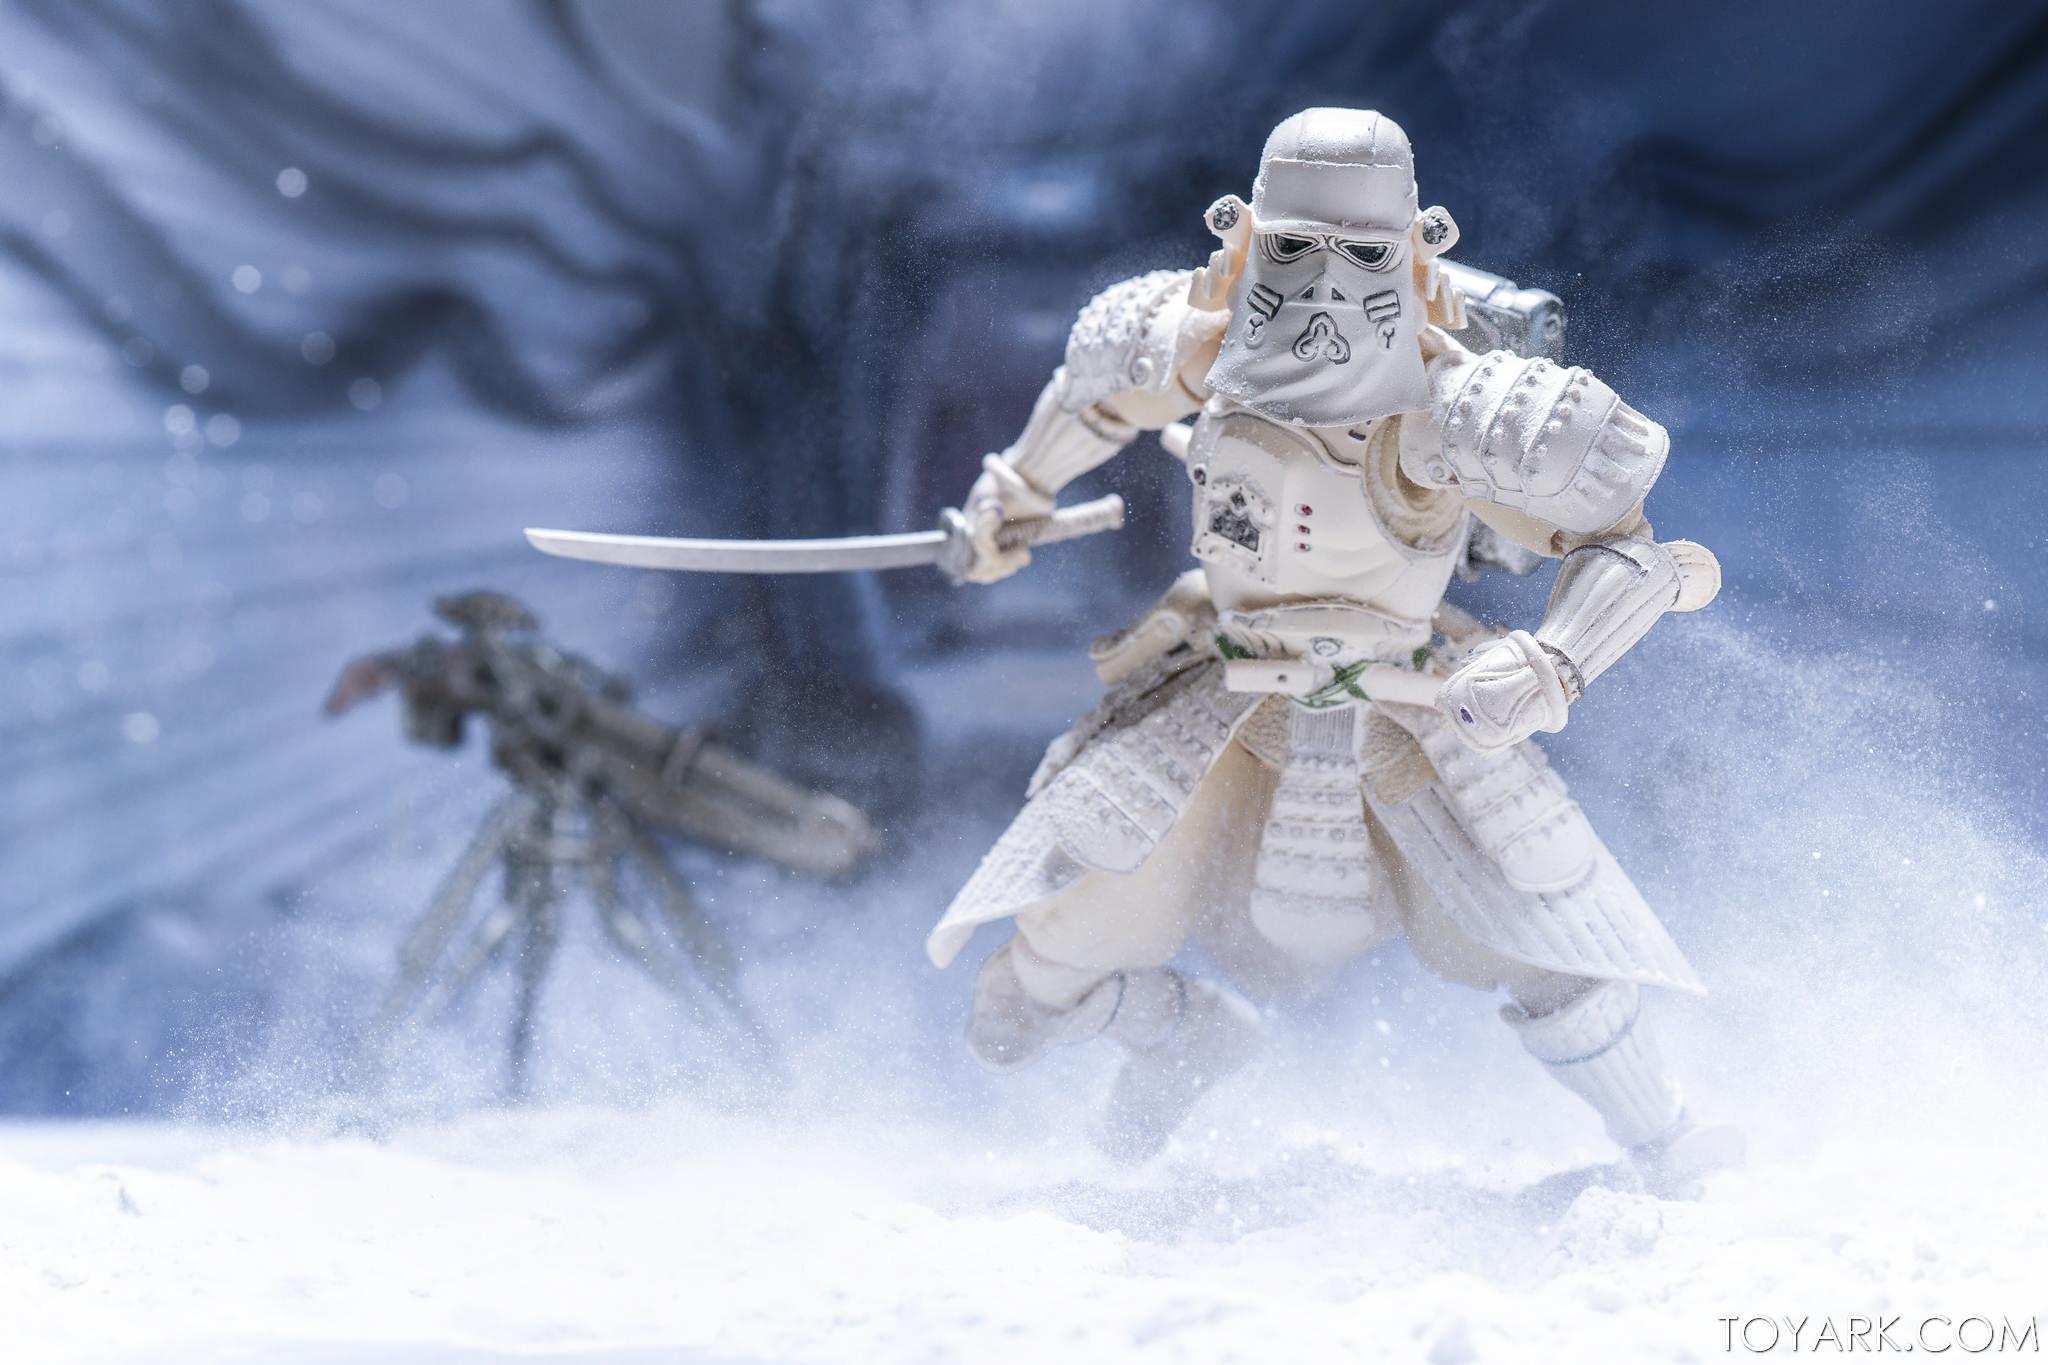 STAR WARS Movie Realization - KANREICHI ASHIGARU SNOWTROOPER Realization-Snowtrooper-42